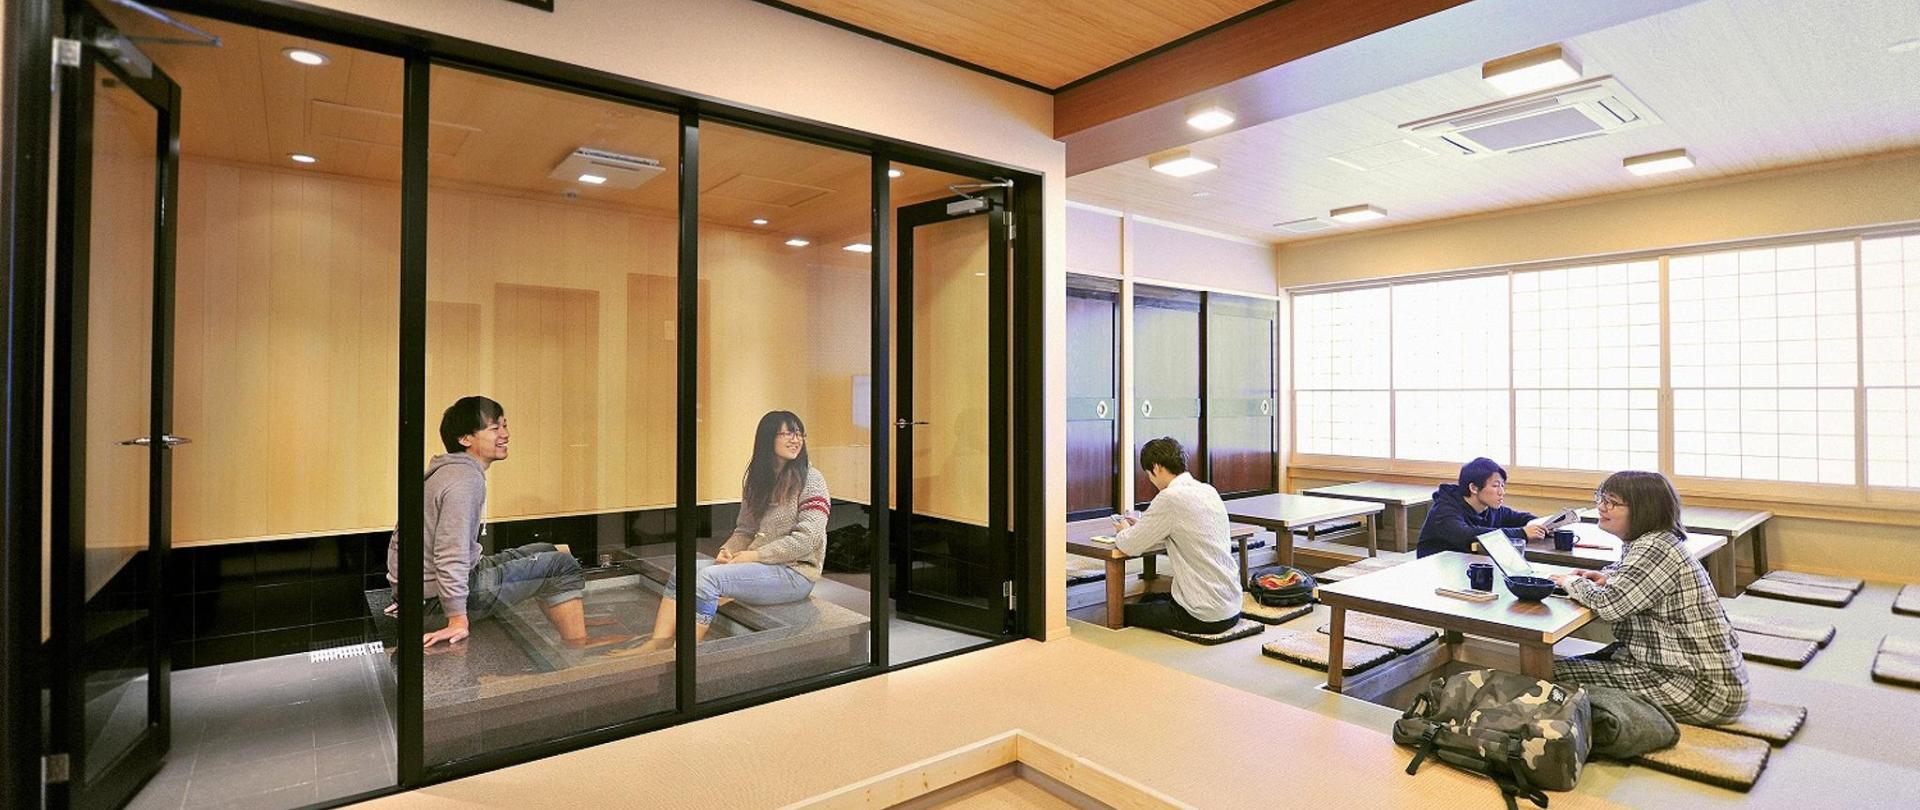 Khaosan World Ryogoku Hostel